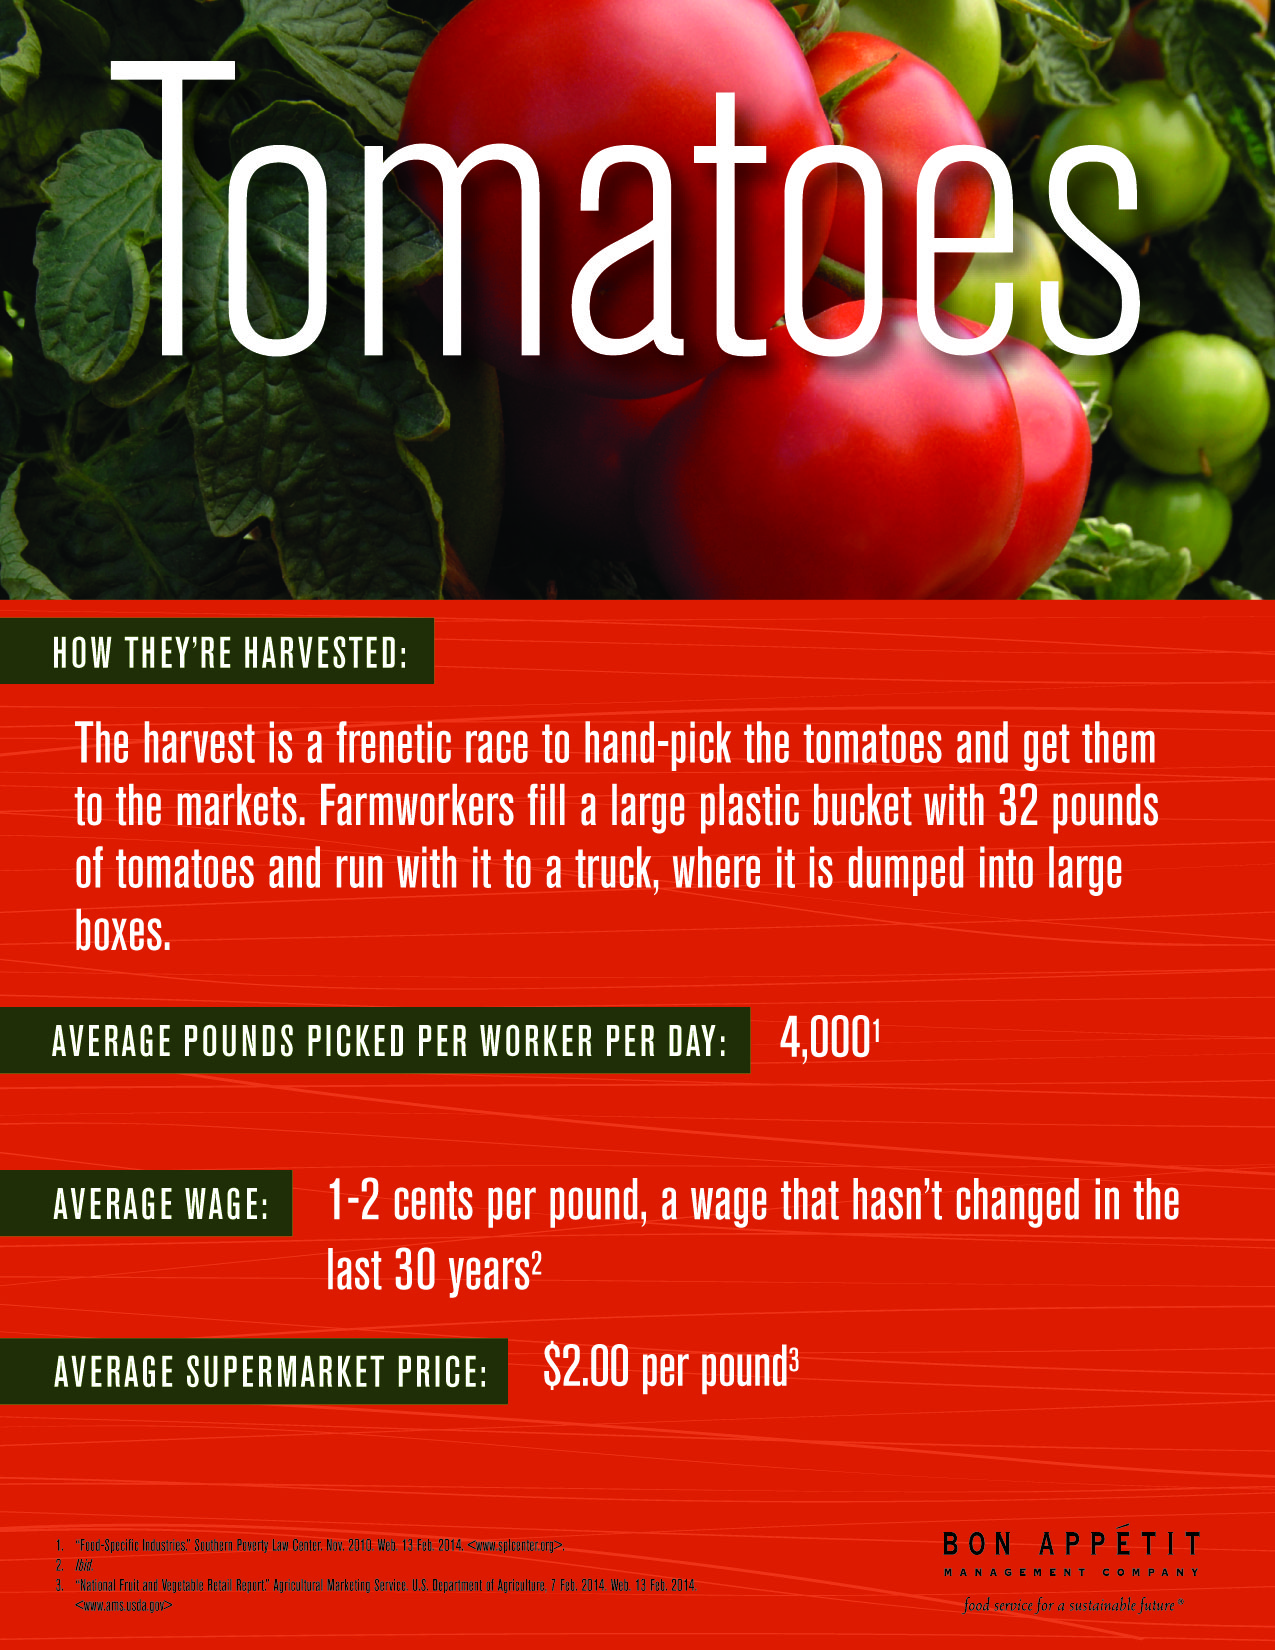 14-4621TableMini-Tomatoes3.jpg